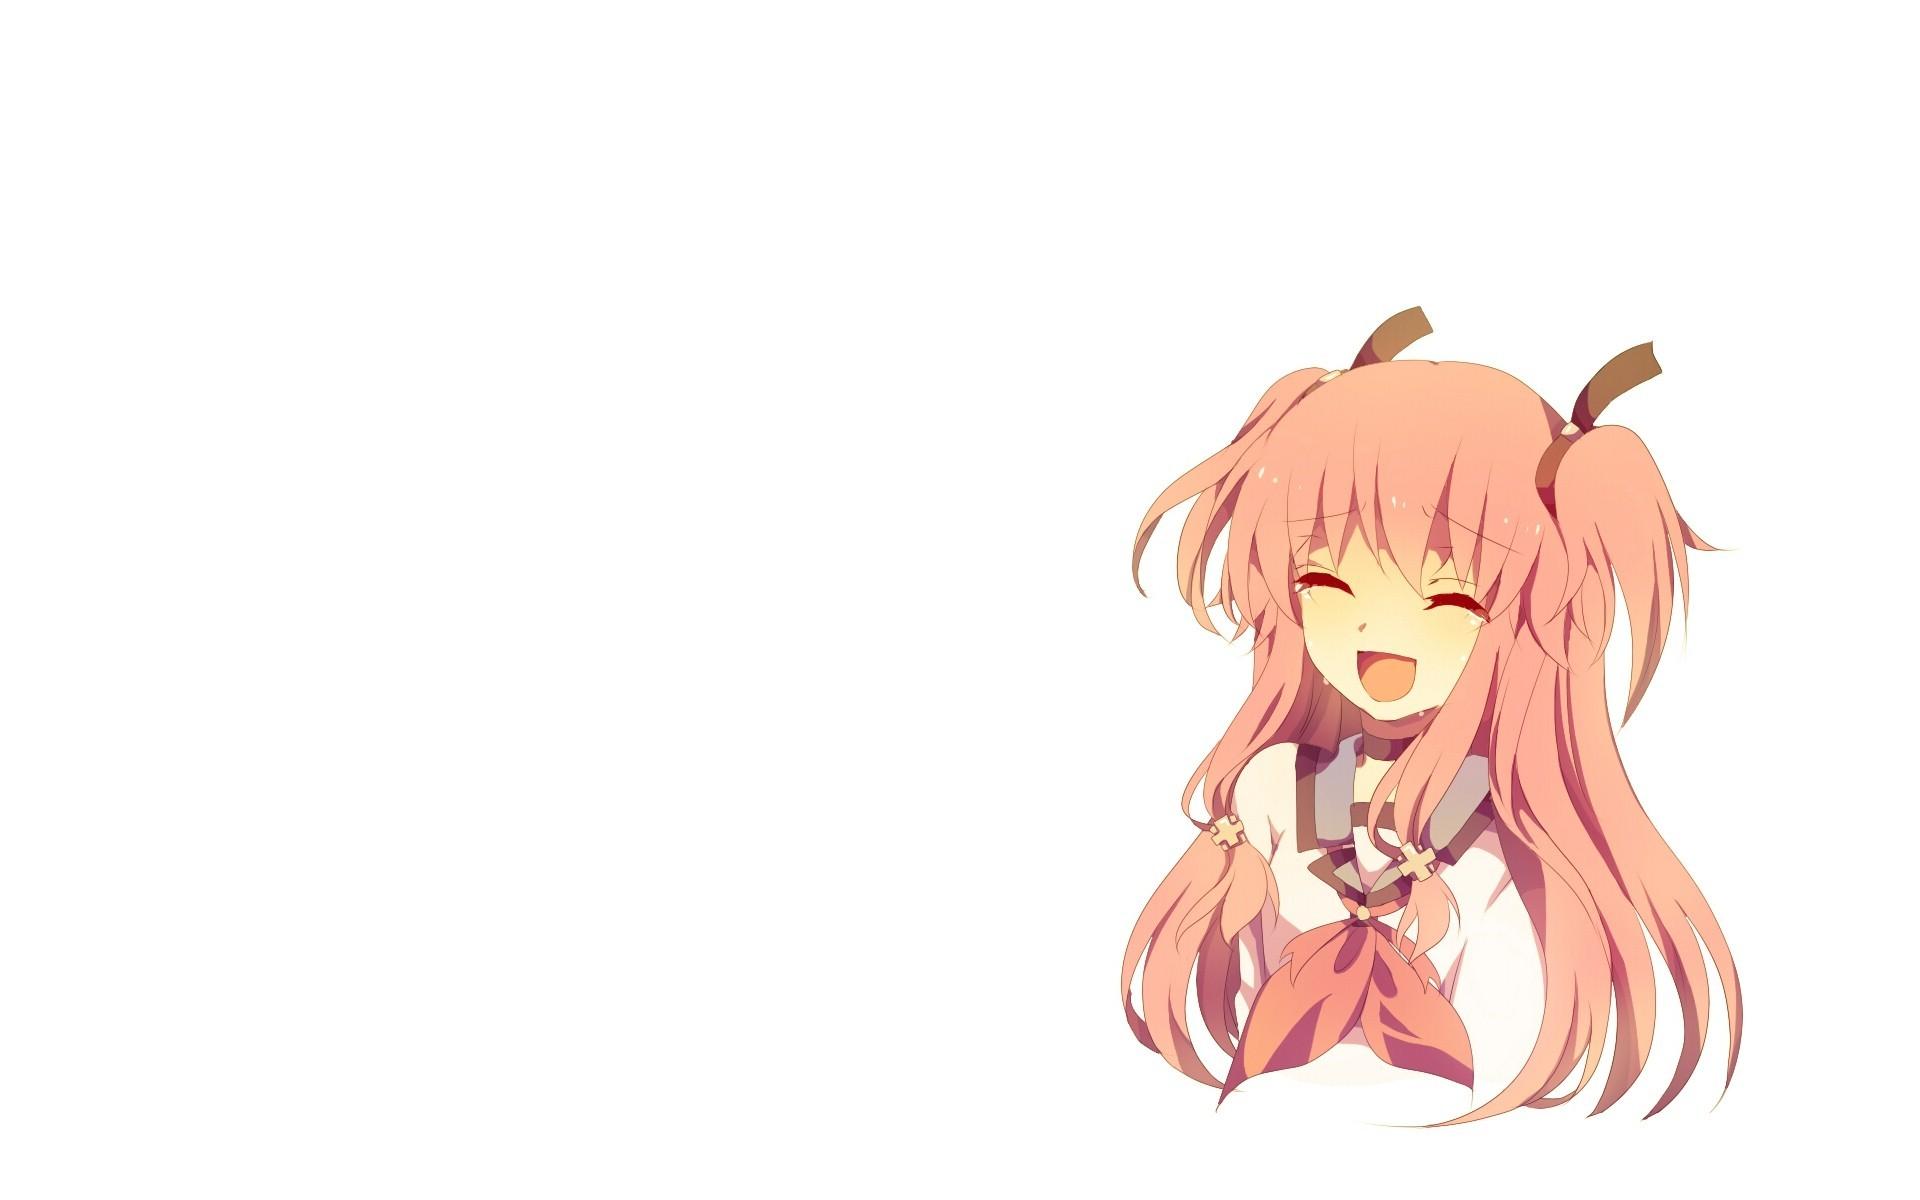 Wallpaper Ilustrasi Gadis Anime Gambar Kartun Ketukan Malaikat